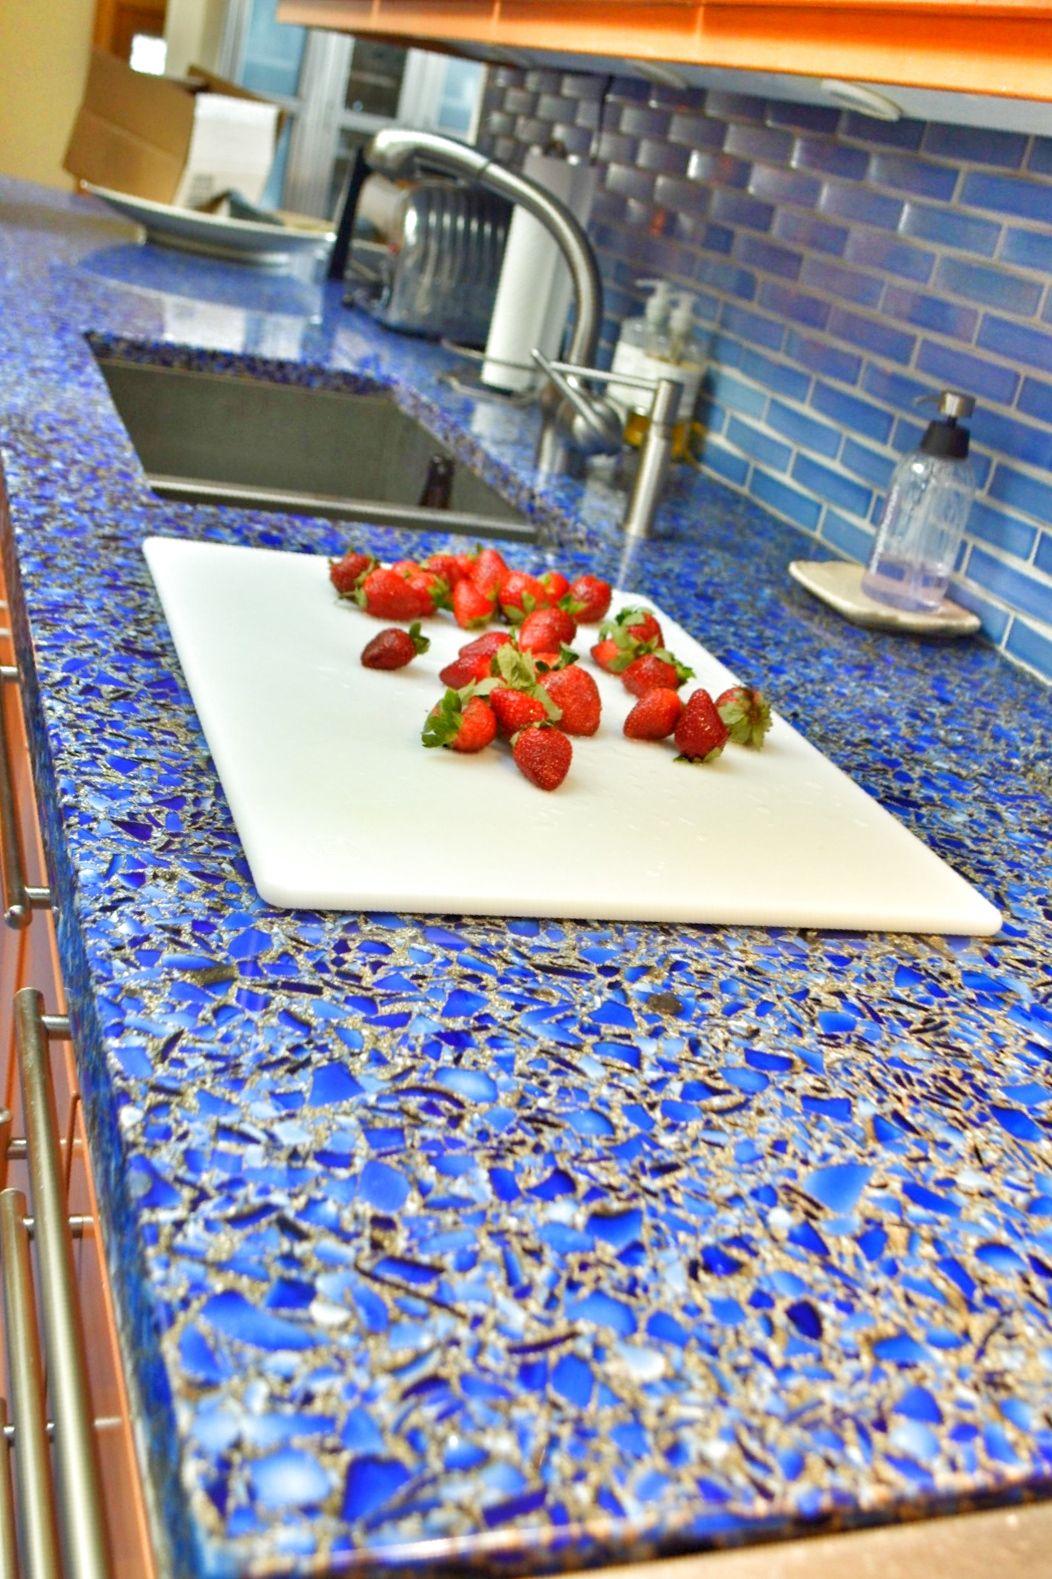 Cobalt skyy patina types of kitchen countertops diy countertops recycled glass countertops countertop